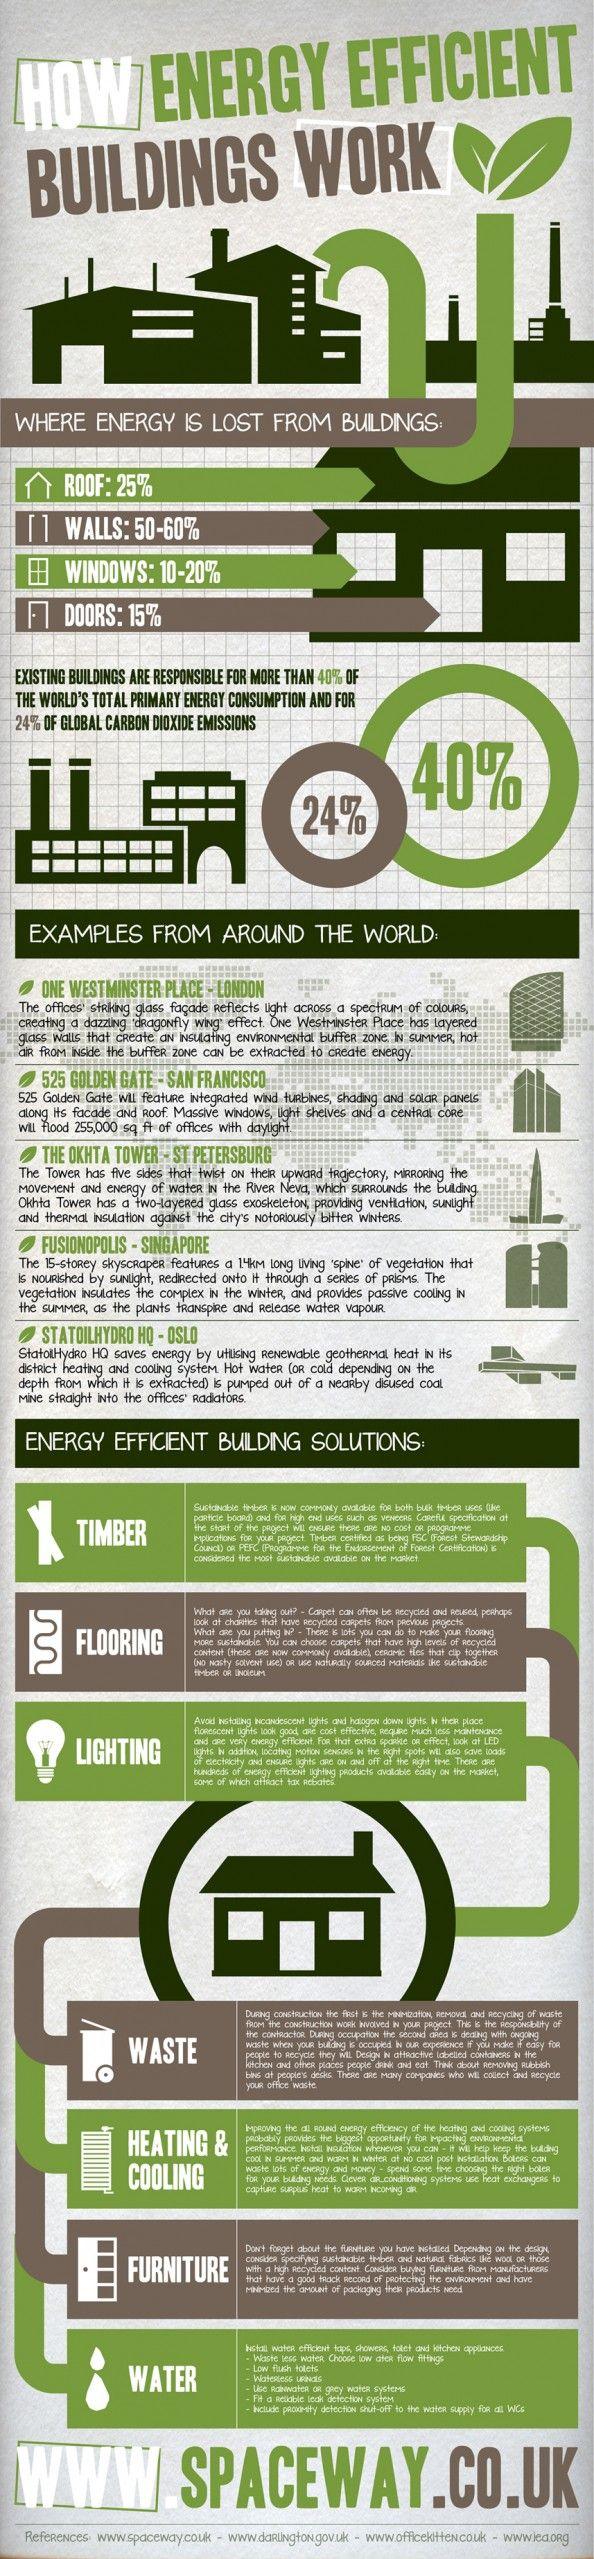 How energy efficient buildings work 61 best